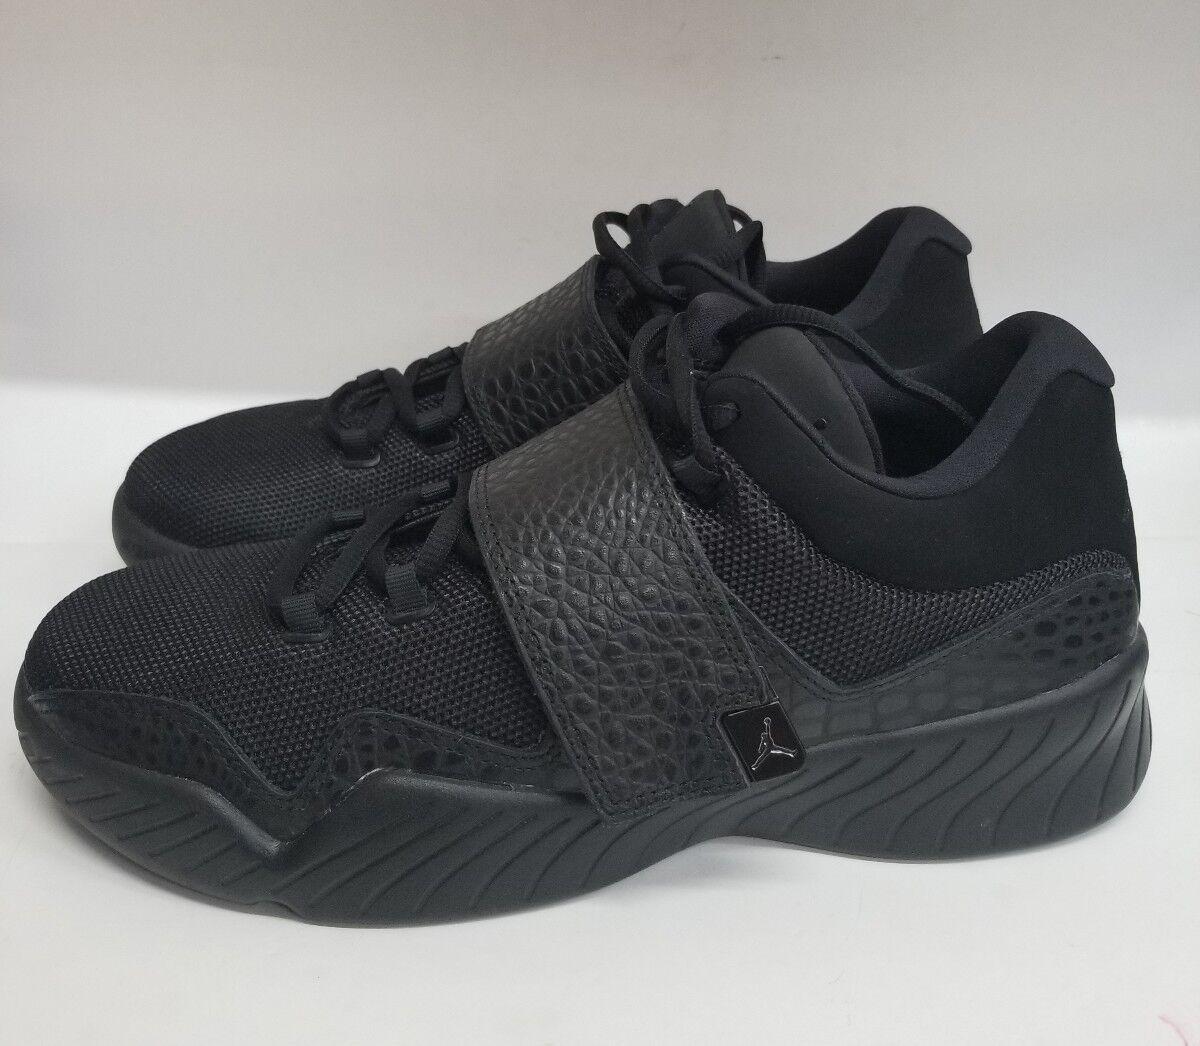 NEW Nike Air Jordan J23 Low Black/Black 854557-001 Men's Size 10 Shoes 854557-001 Black/Black 6cf163